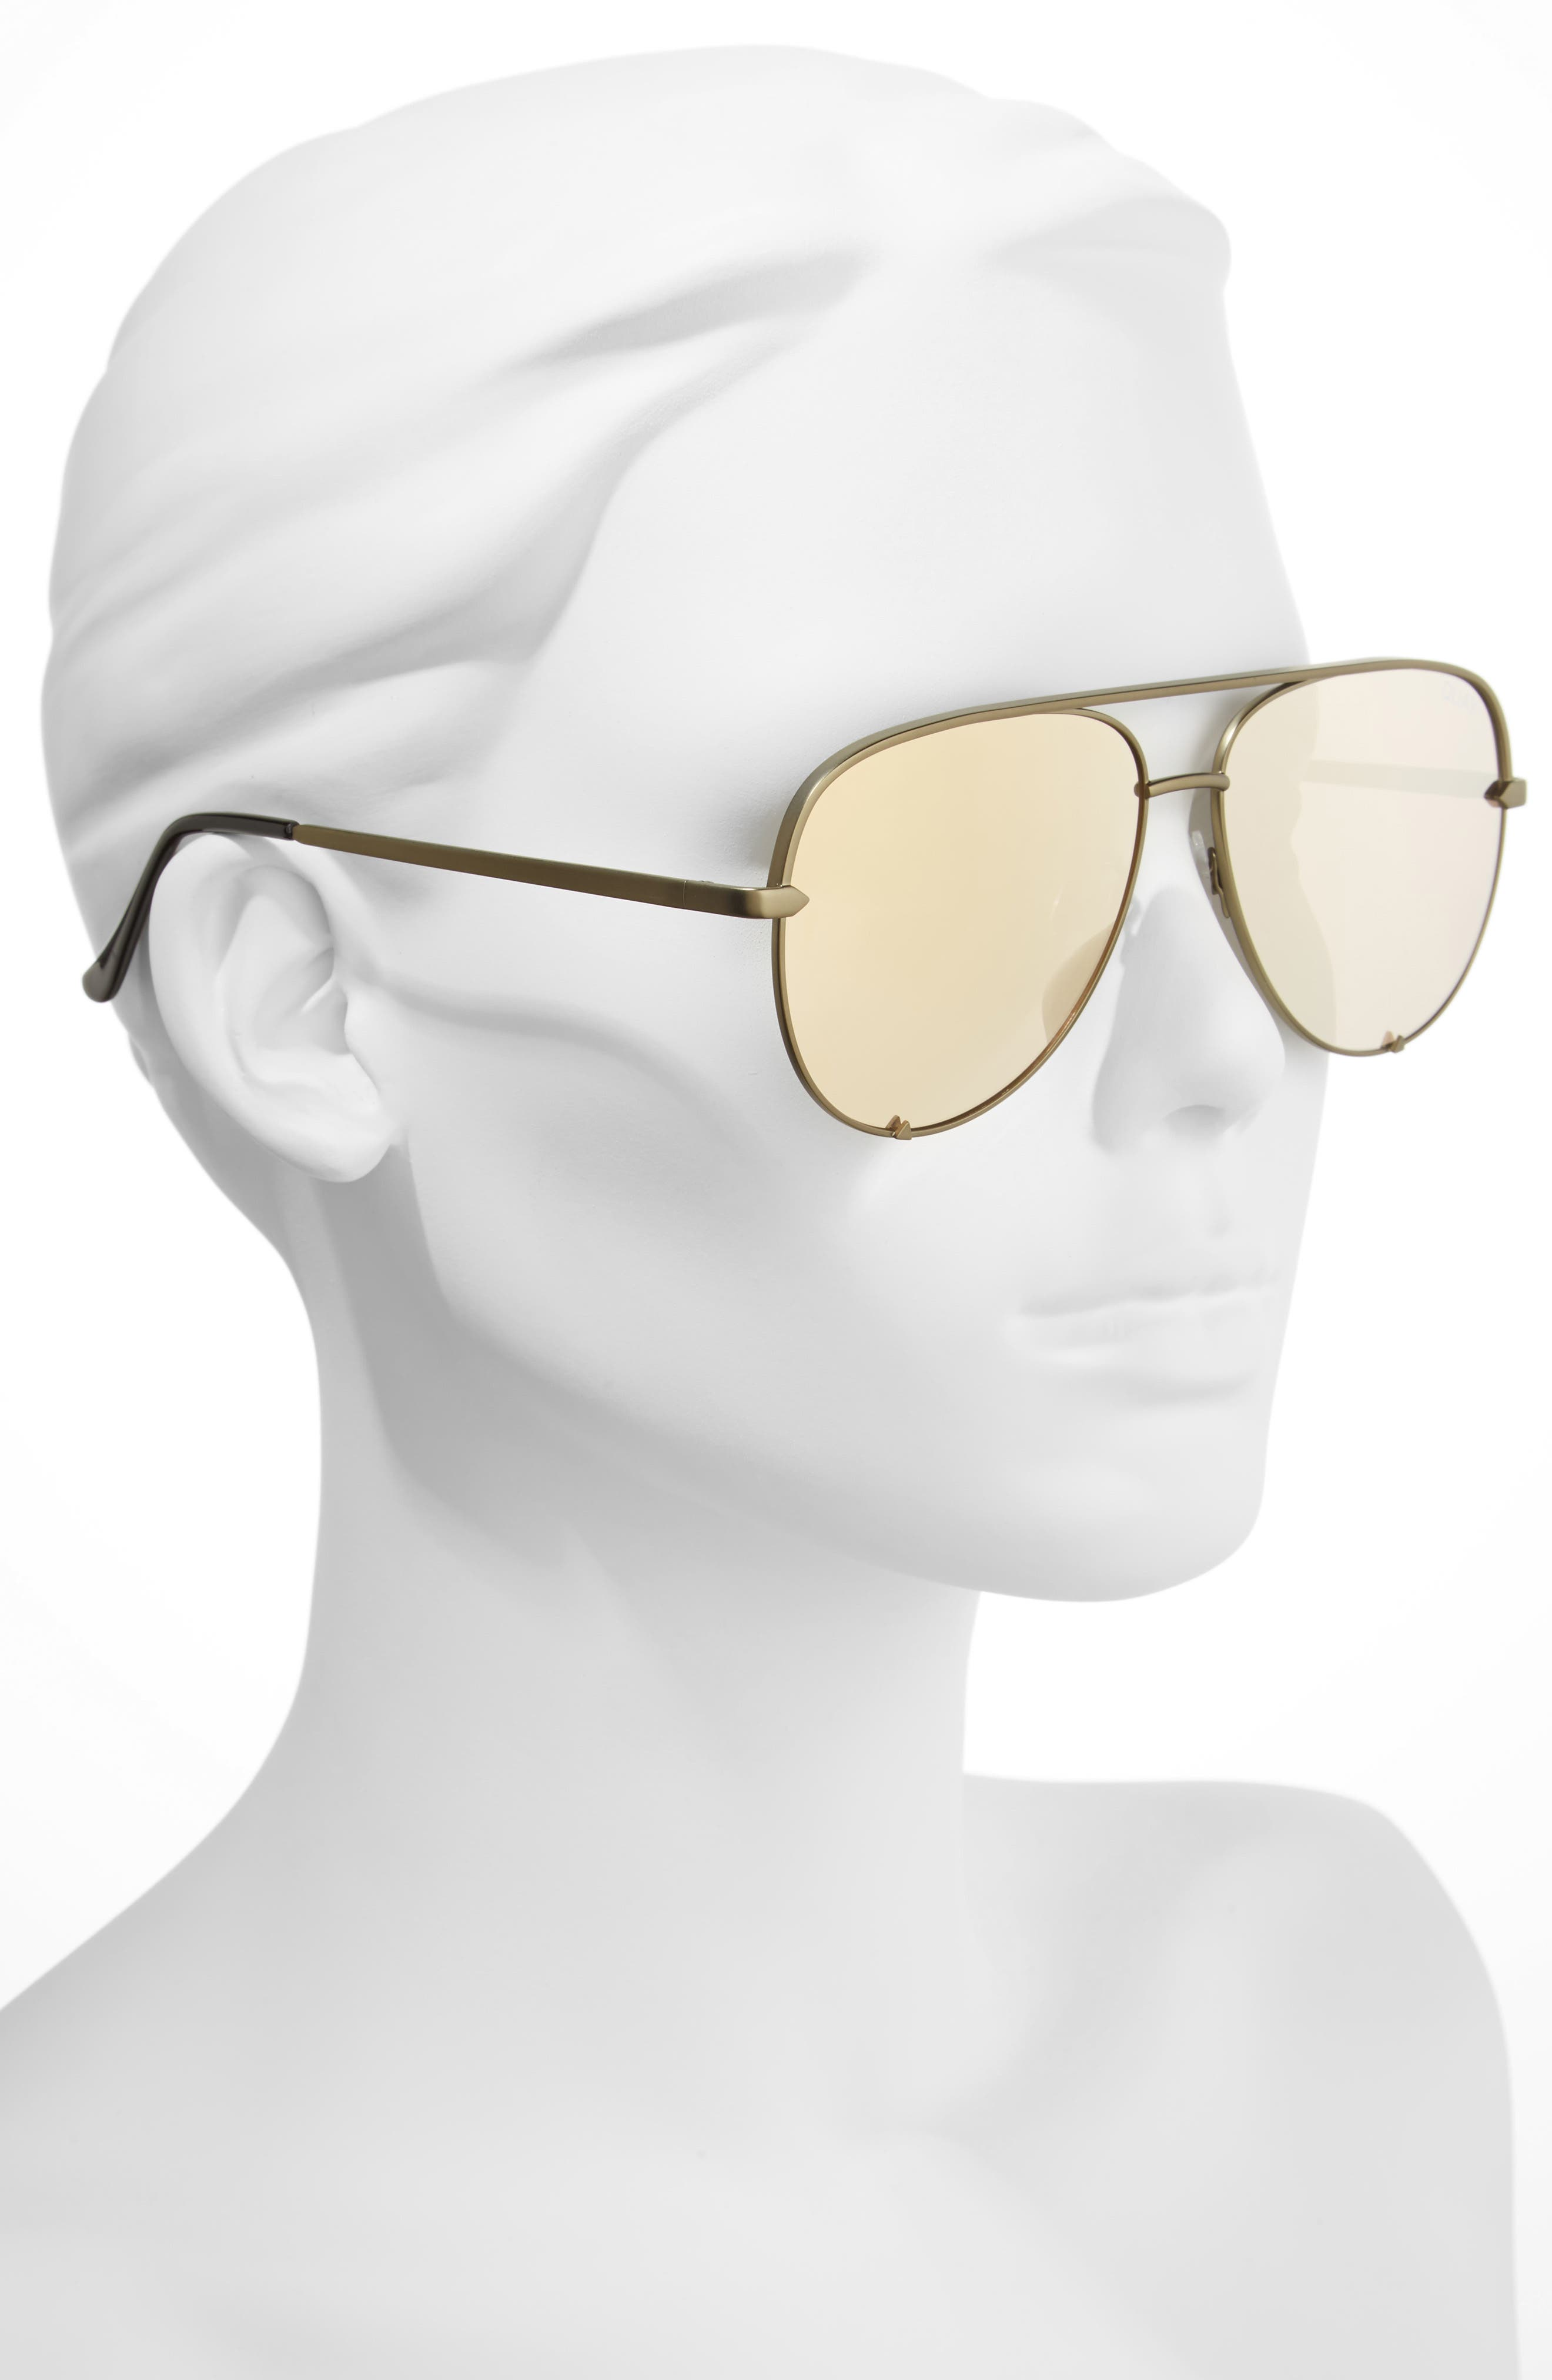 x Desi Perkins High Key 60mm Aviator Sunglasses,                             Alternate thumbnail 3, color,                             Green/ Gold